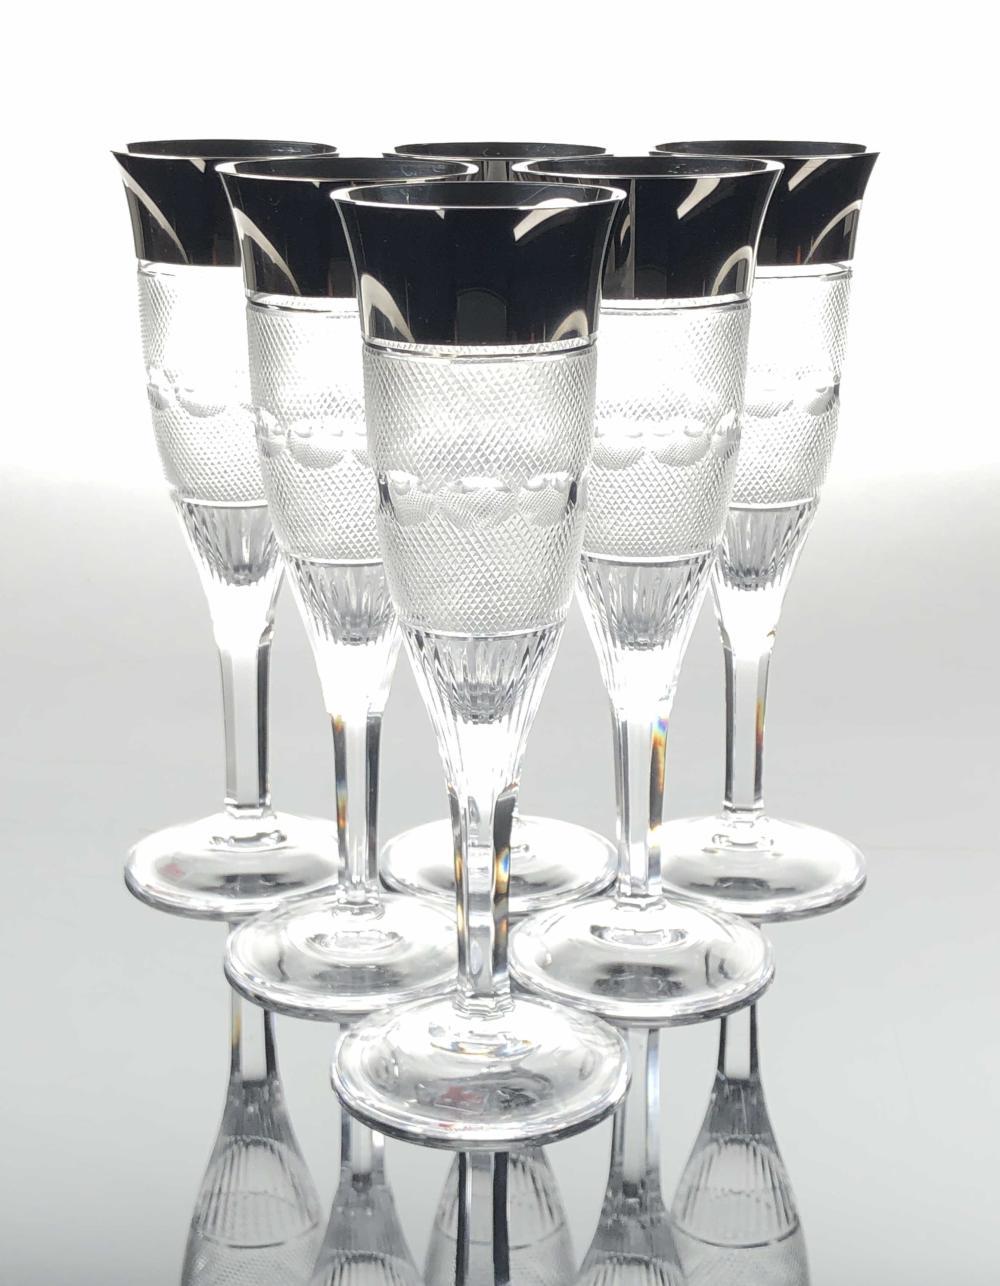 6PC MOSER SPLENDID PLATINUM TRIMMED FLUTED CHAMPAGNE GLASSES